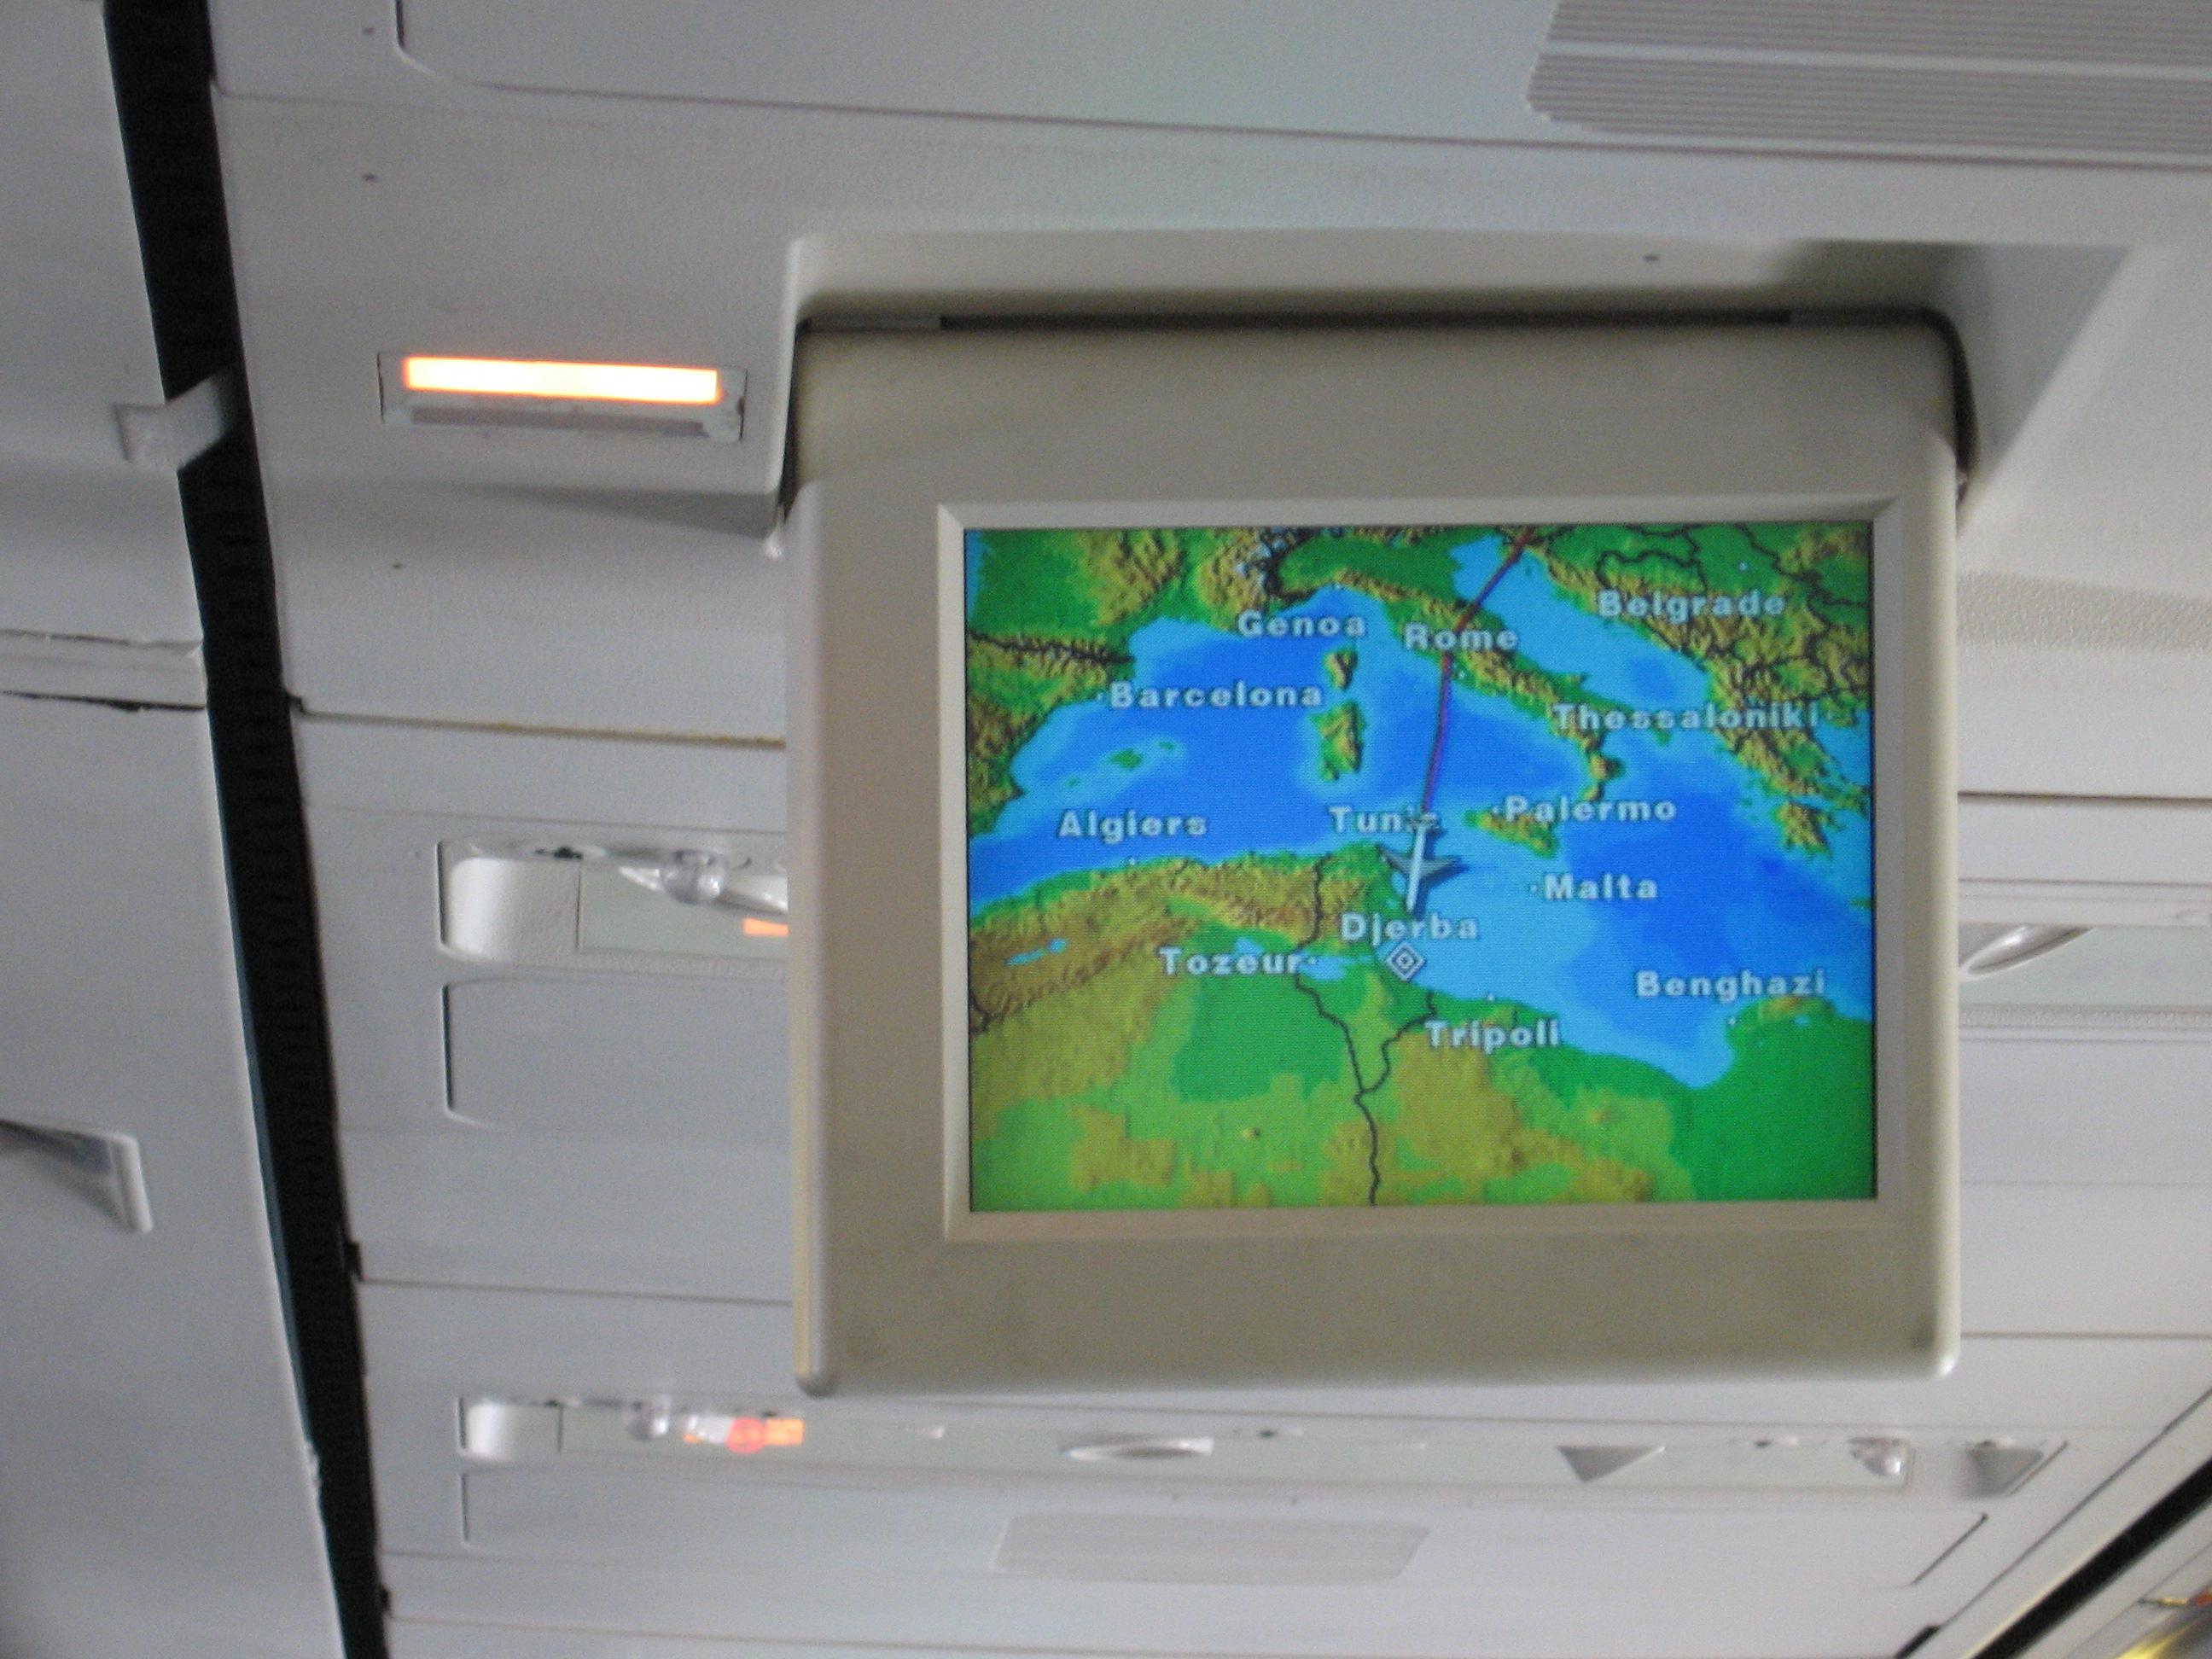 Approaching Djerba Airport